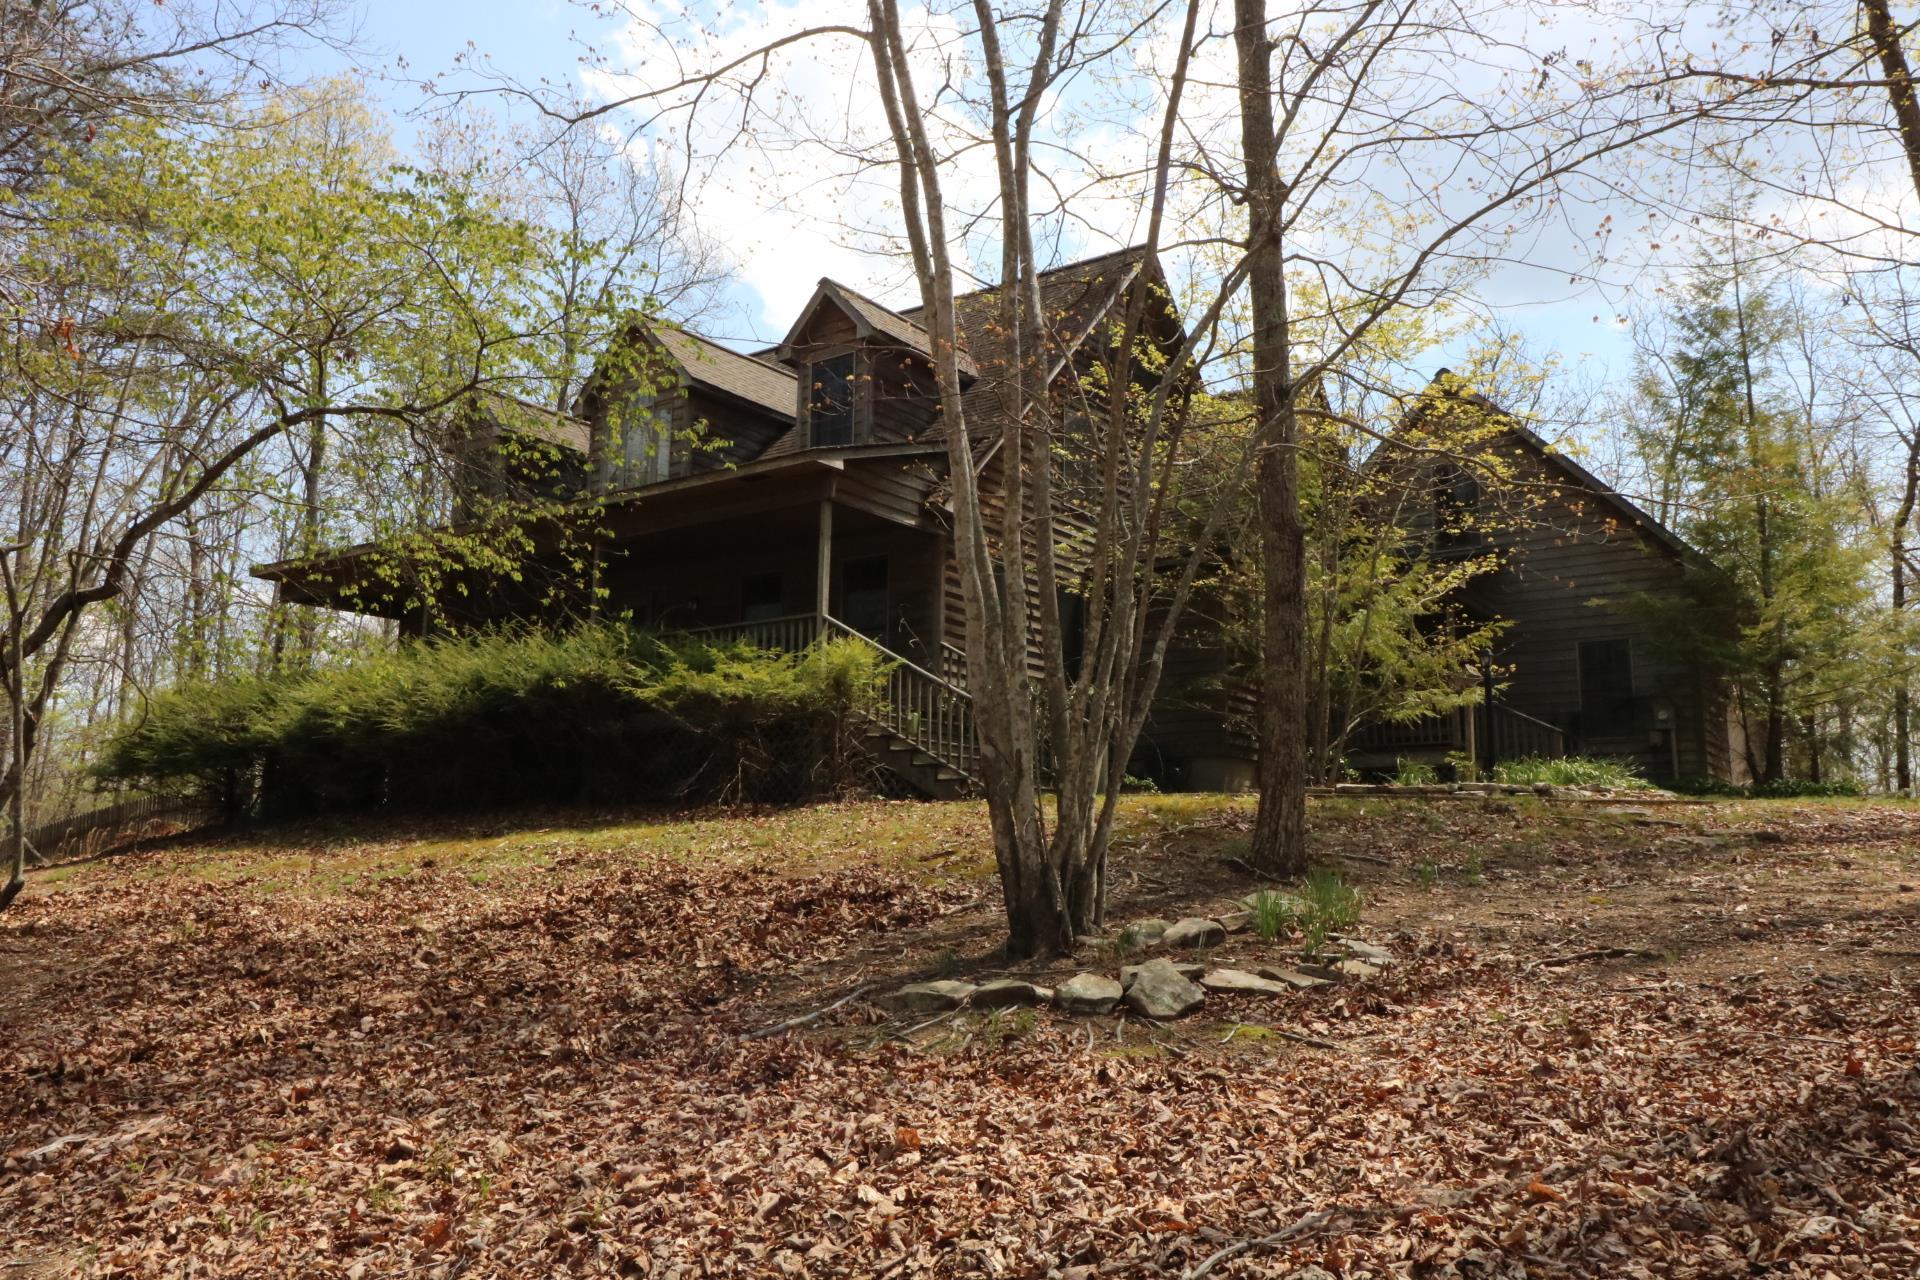 2226 Lakeshore Dr, Monteagle, TN 37356 - Monteagle, TN real estate listing